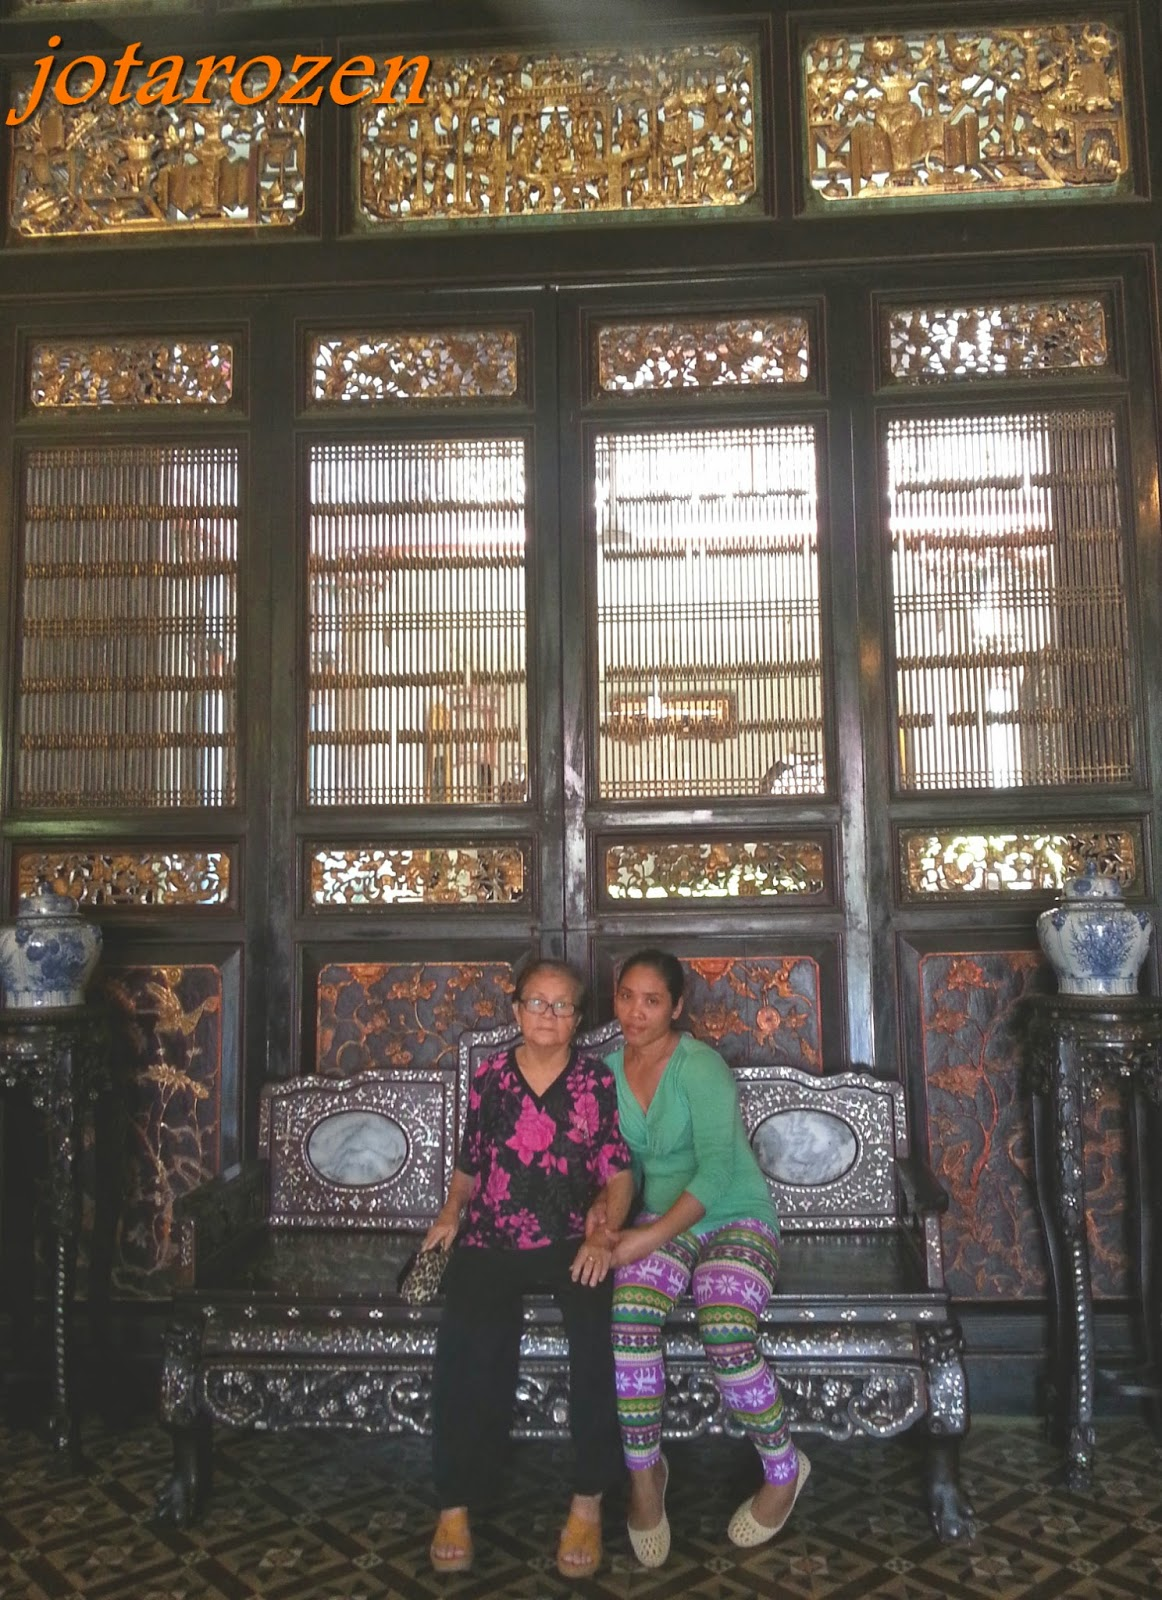 Footsteps Jotaros Travels Sites Cheong Fatt Tze  : 17CarvedTimberRearPanelMainEntranceCheongFattTzeMansionPenang 069 from jotarofootsteps.blogspot.com size 1162 x 1600 jpeg 412kB